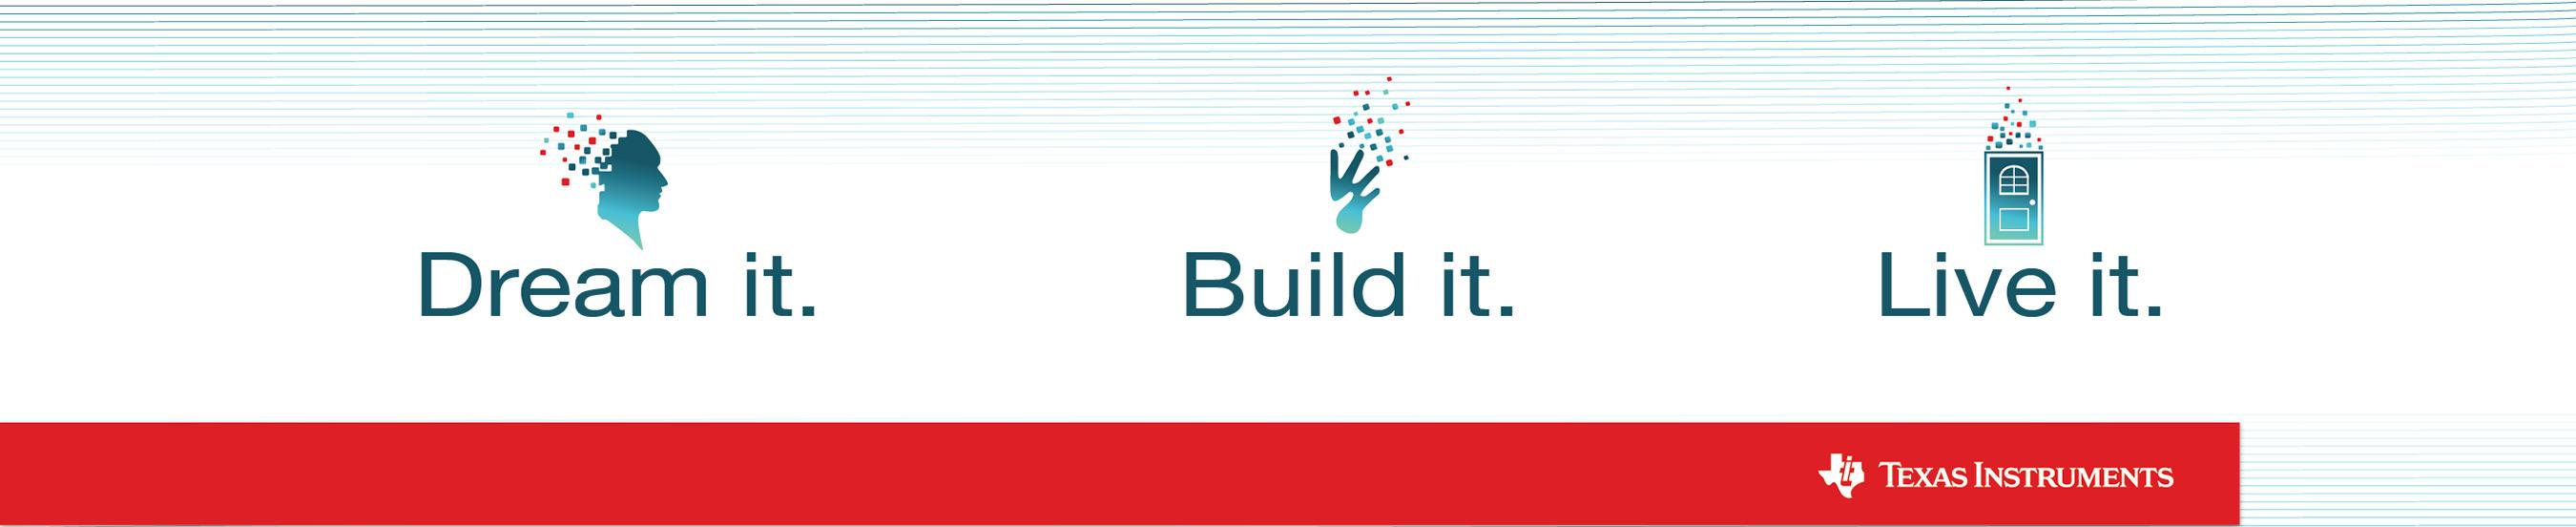 Dream Build Live Banner